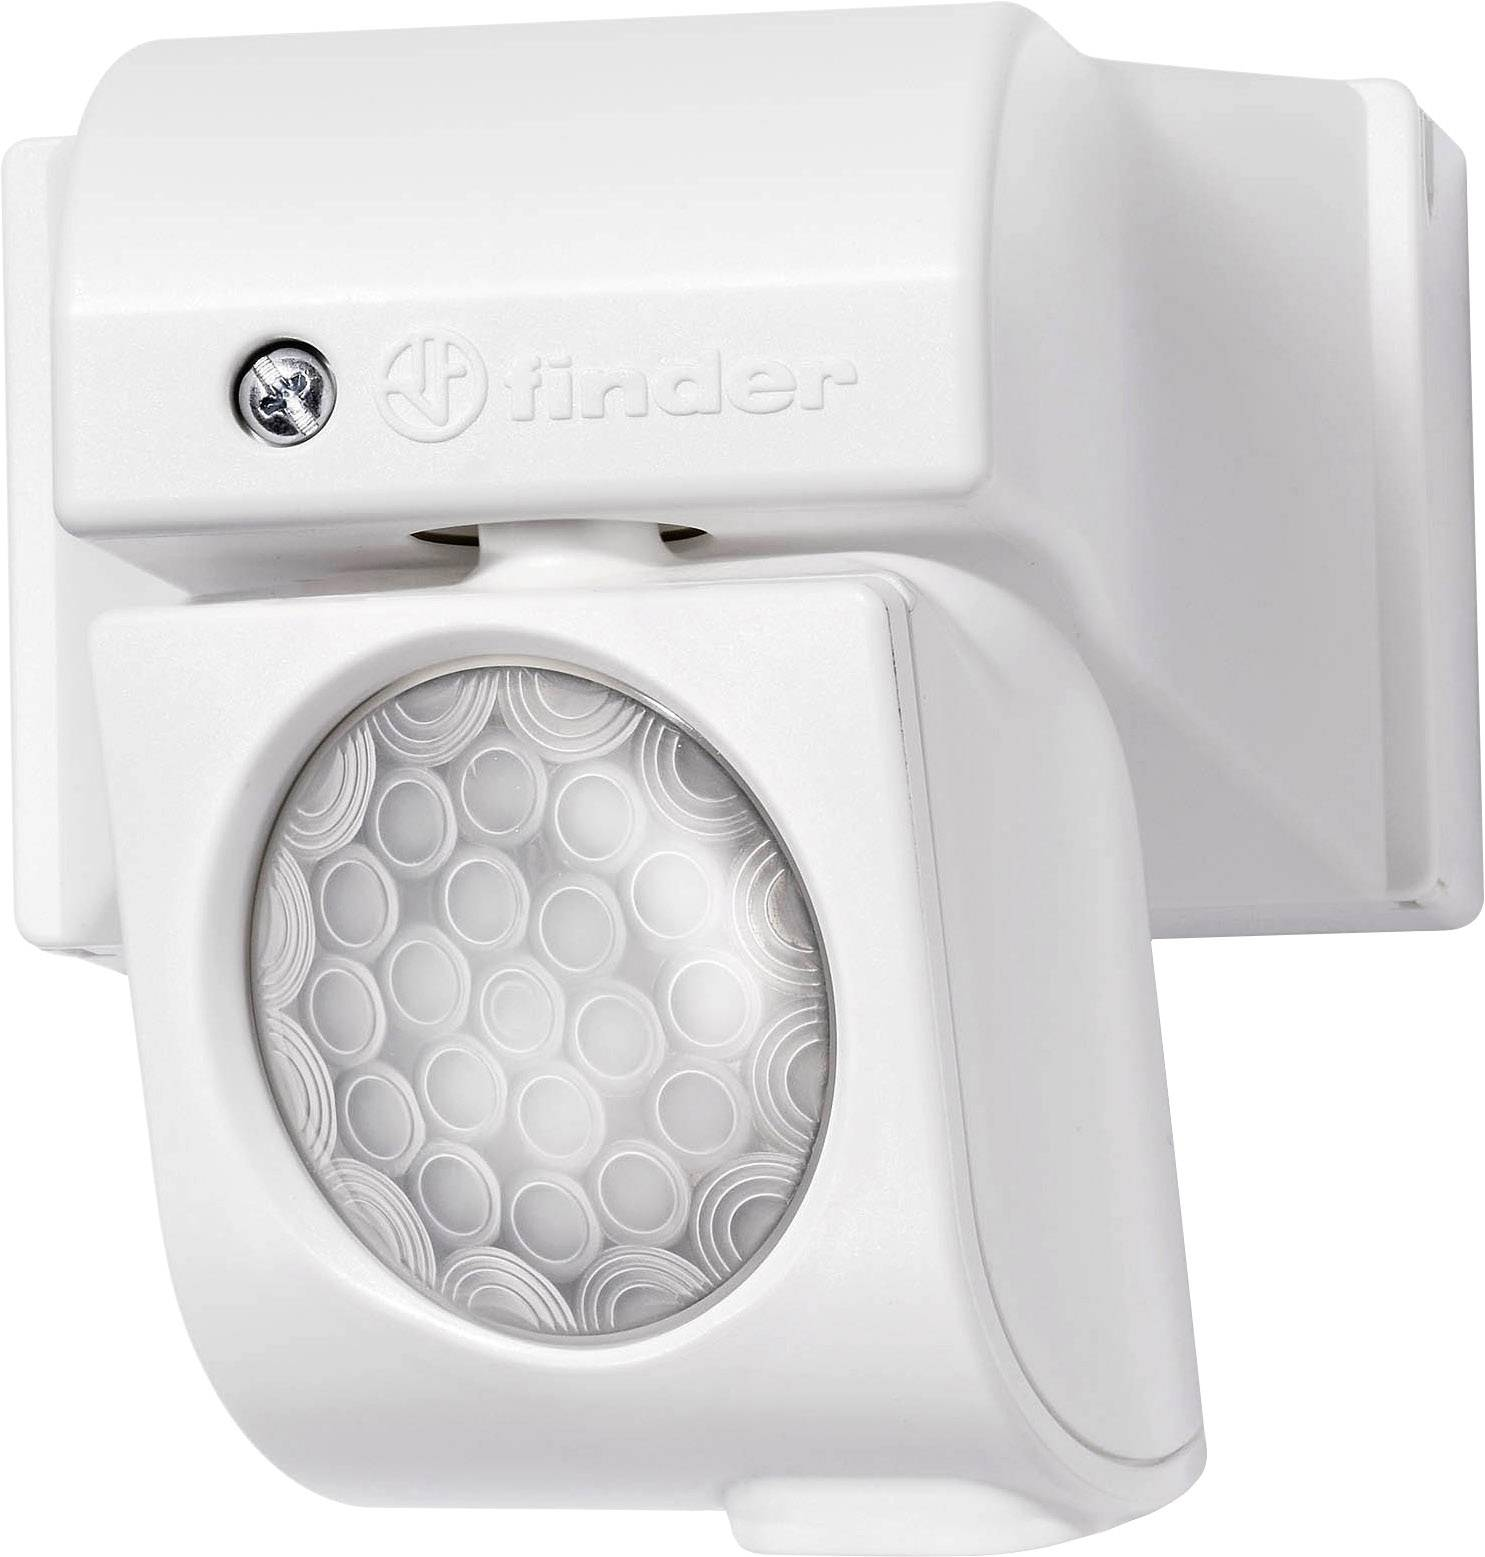 IR detektor pohybu Finder 18.A1.8.230.0000 18.A1.8.230.0000, 230 V/AC, Max. dosah 10 m